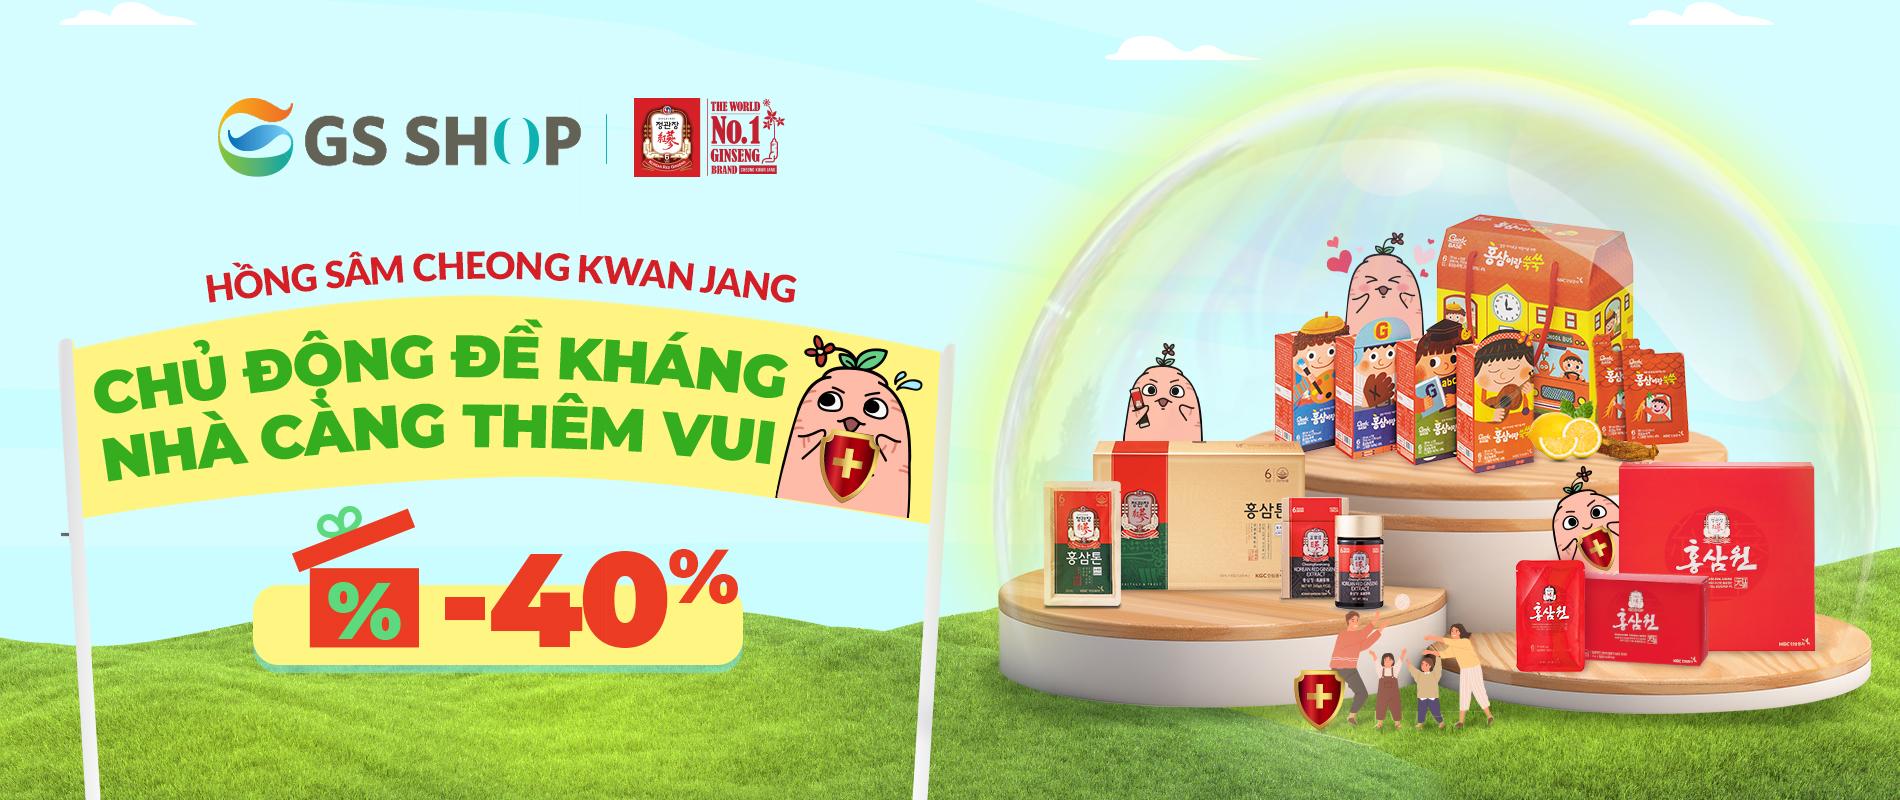 [GS SHOP] Hồng sâm Choeng Kwan Jang